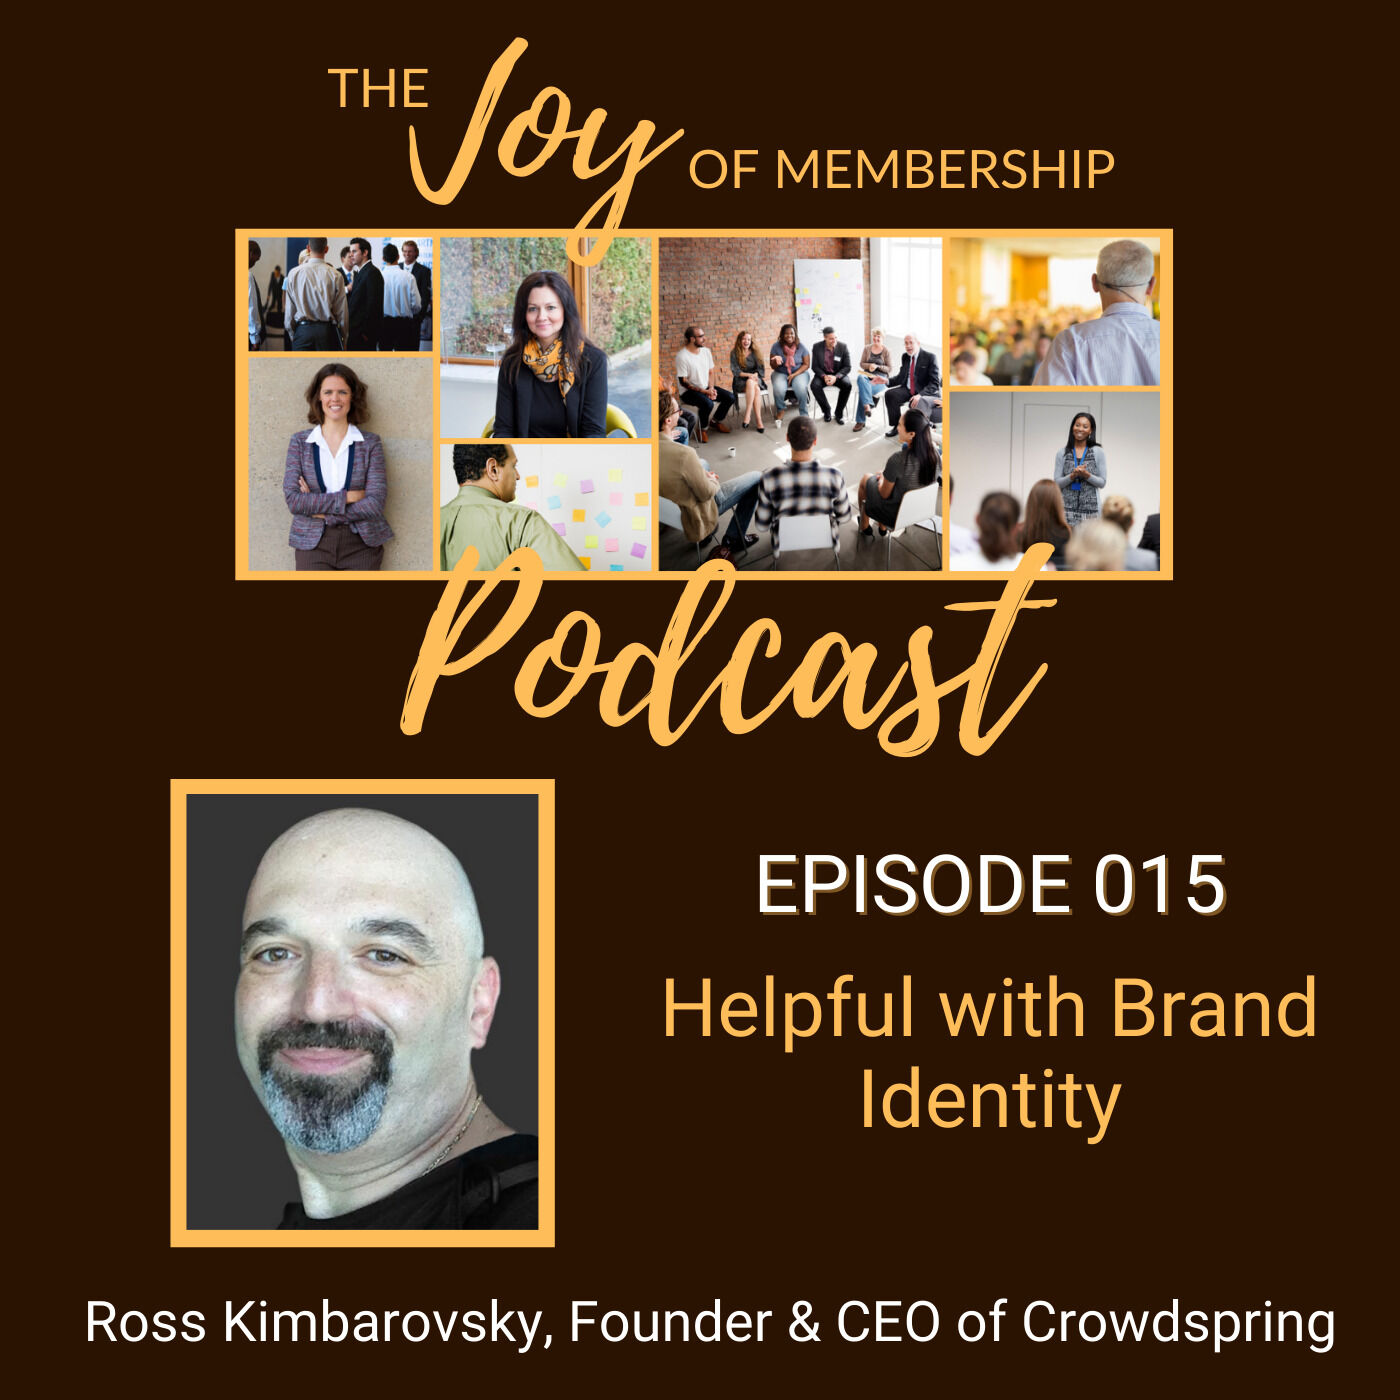 Helpful with Crowdsourcing Design: Ross Kimbarovsky